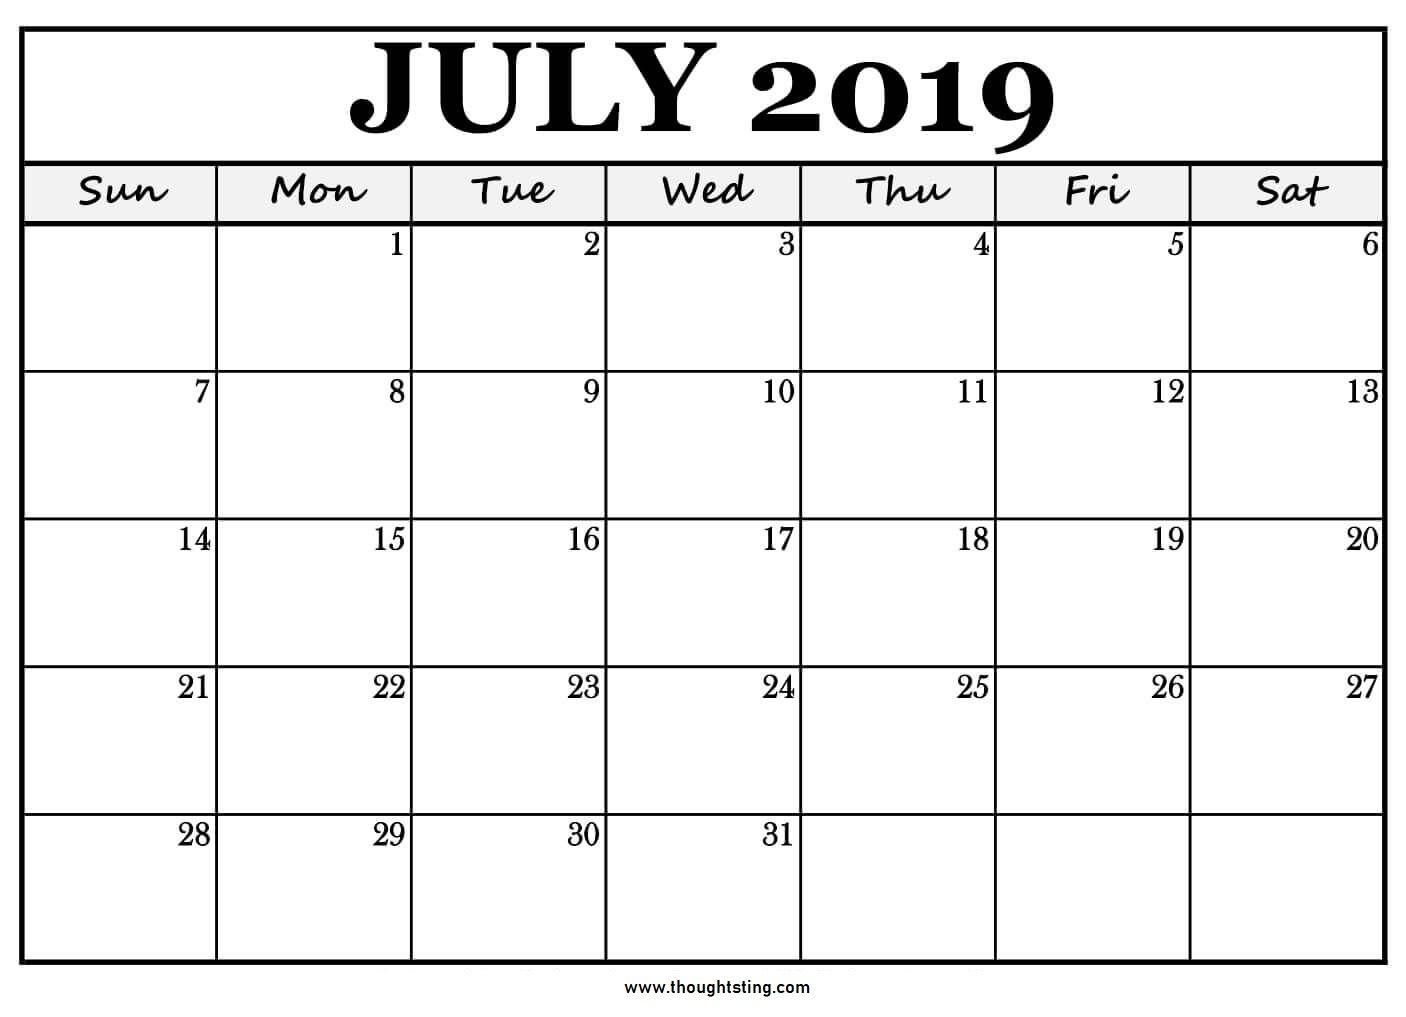 July 2019 Printable